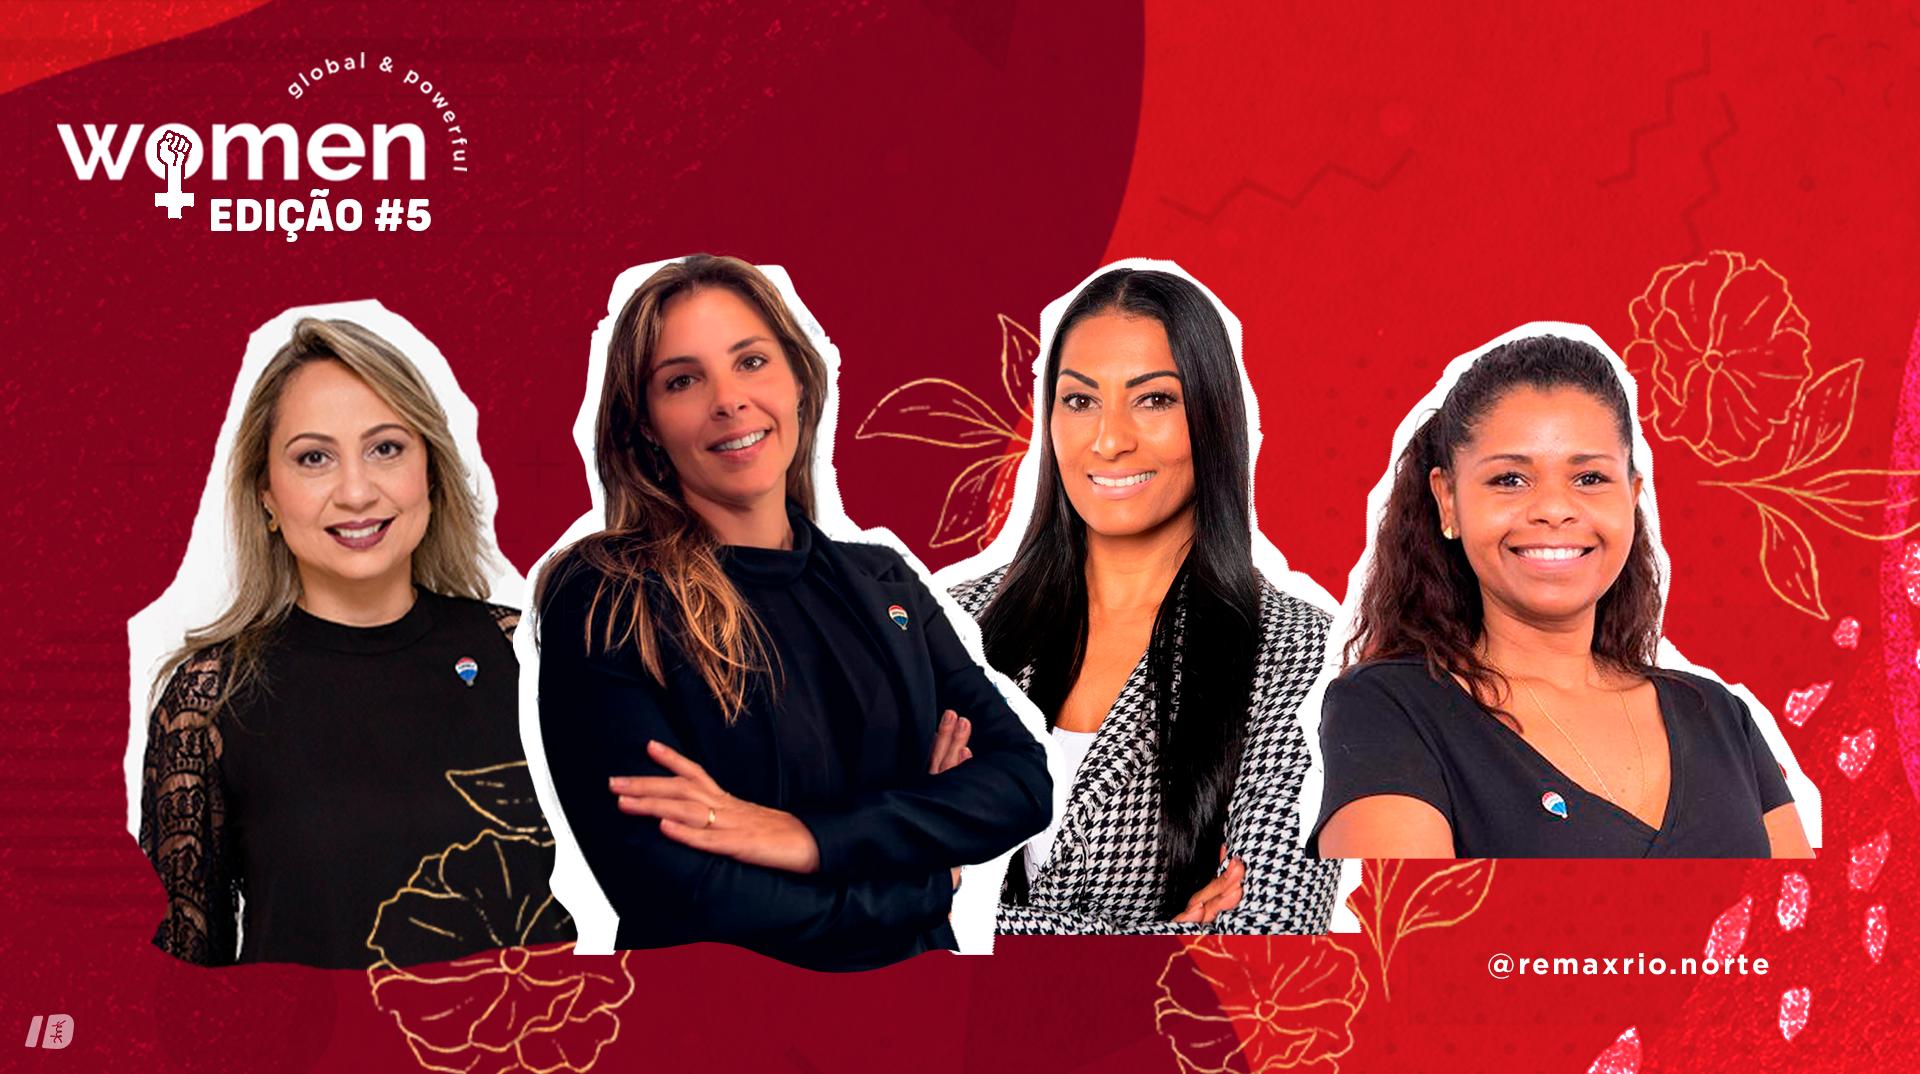 capa - Women Global and Powerful - os desafios das mulheres no mercado corporativo